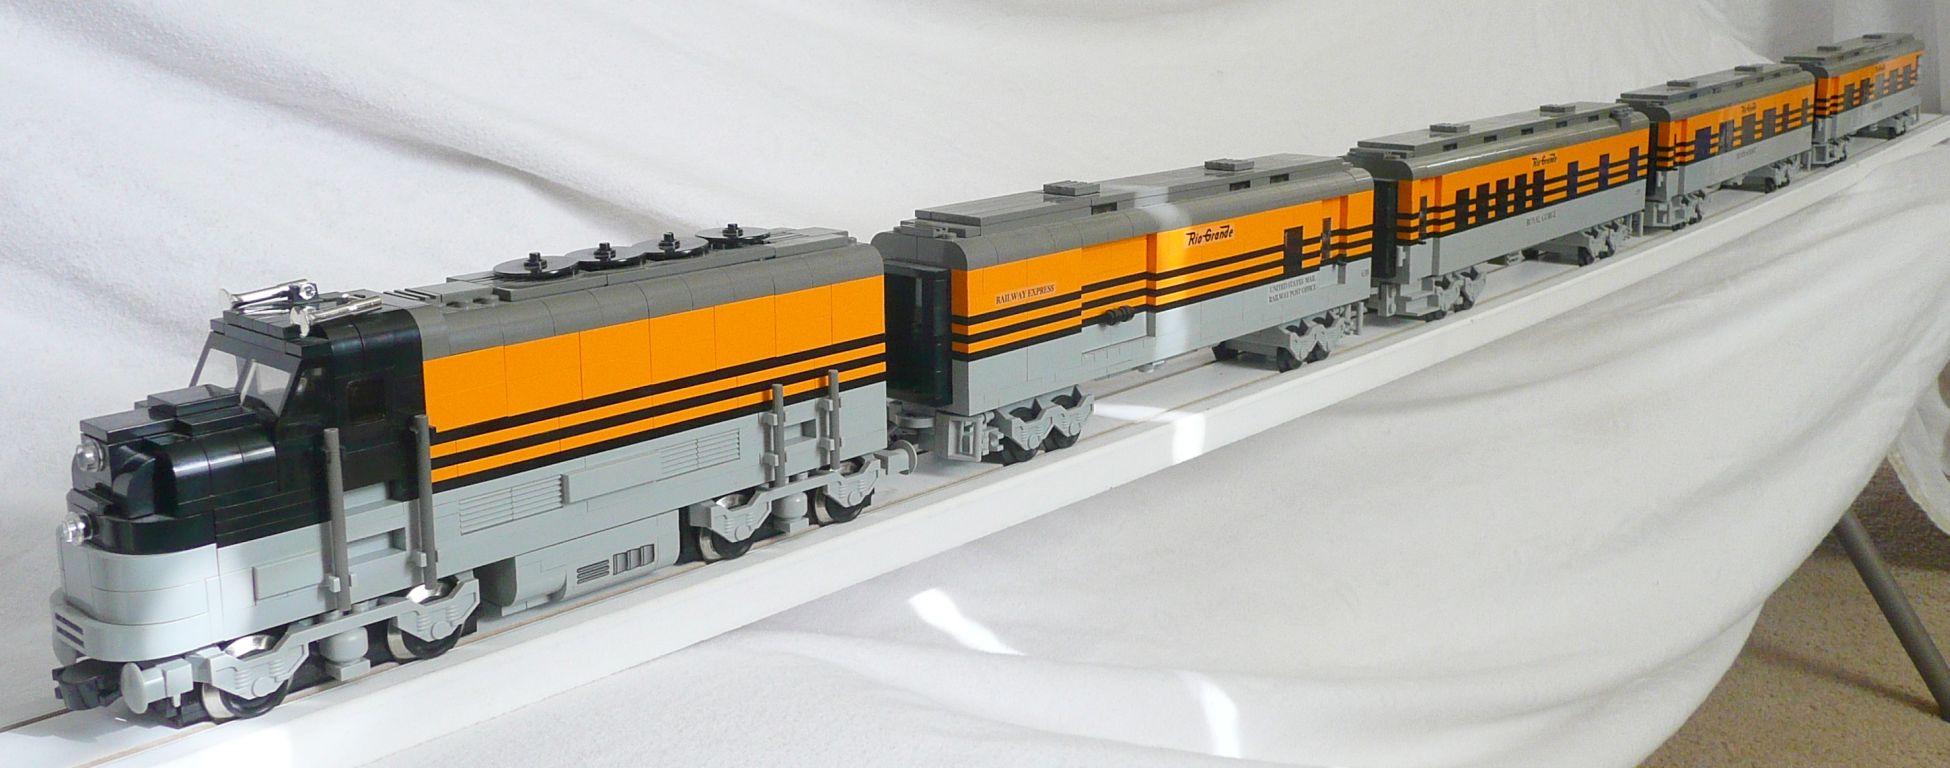 drg_iso_train.jpg